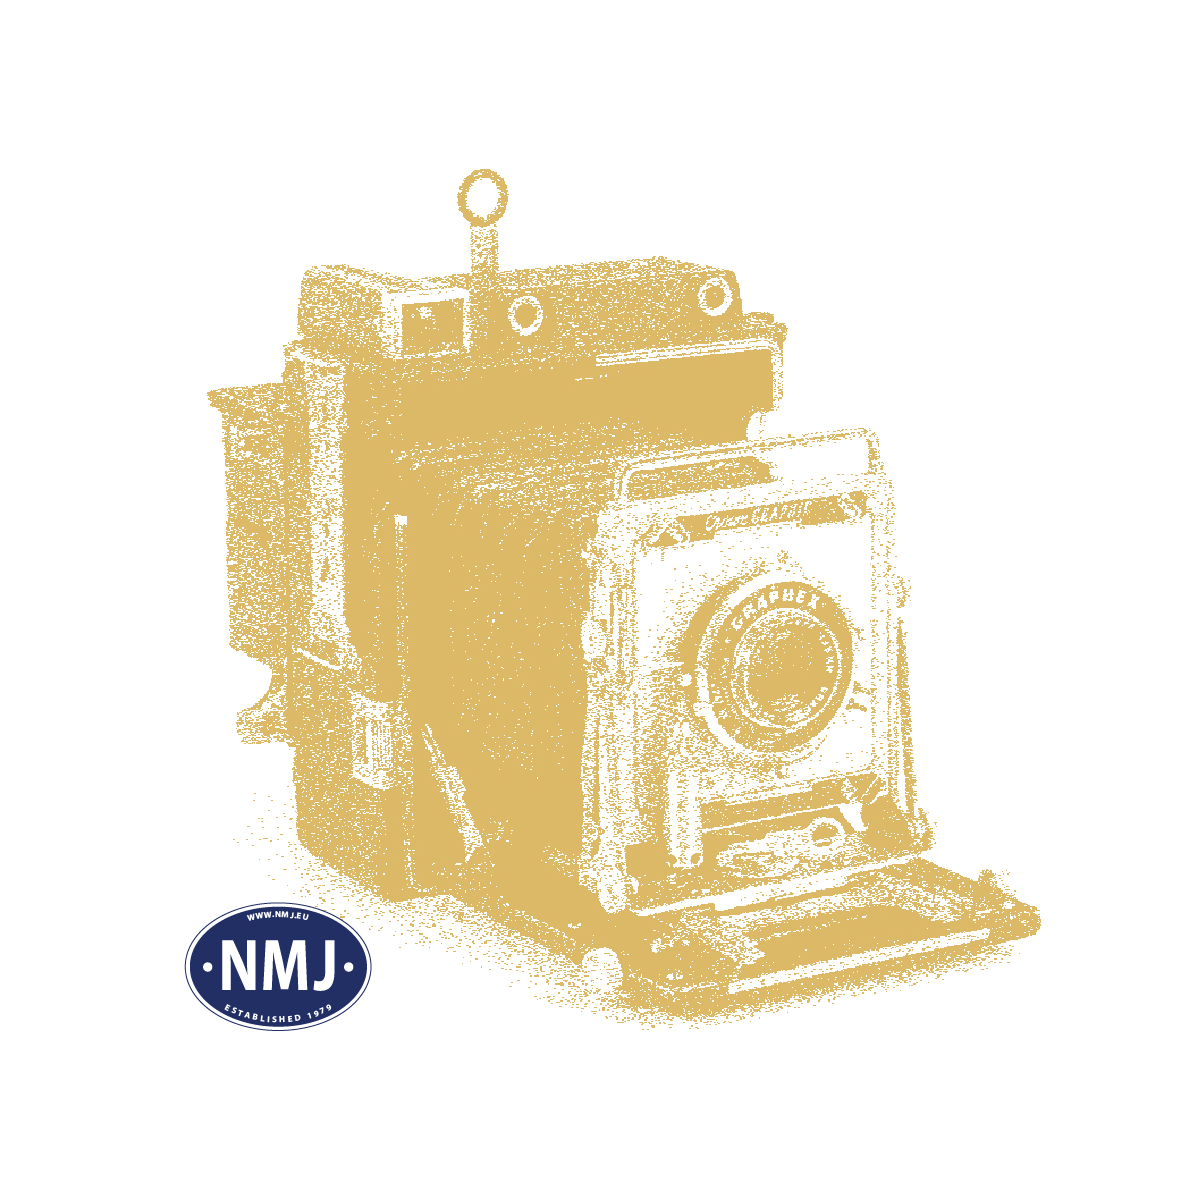 NMJT90207 - NMJ Topline MAV M61.005, DC